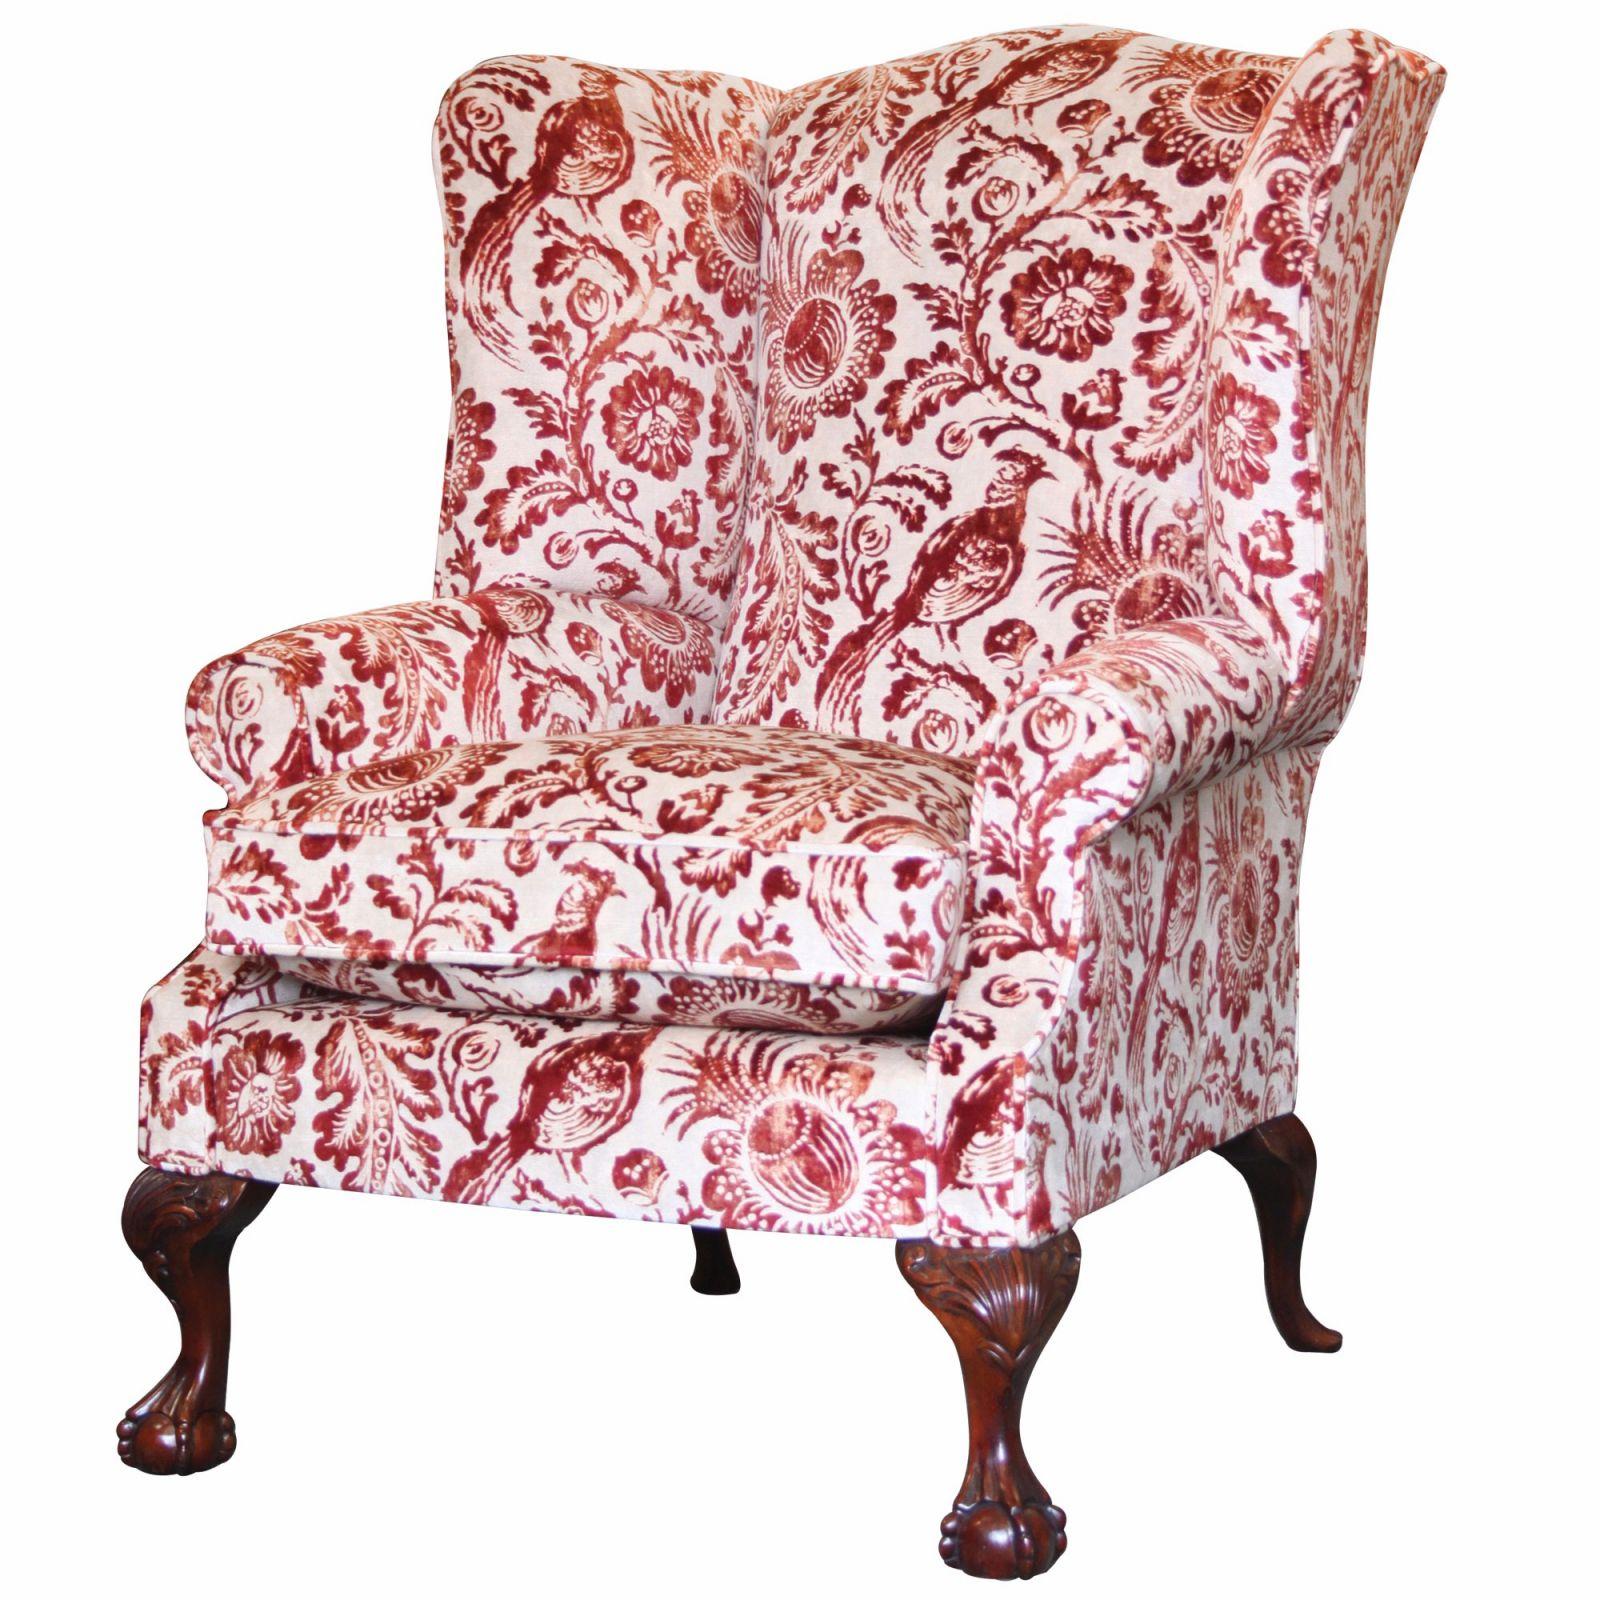 Coleridge wing chair in Dutch Pheasant velvet